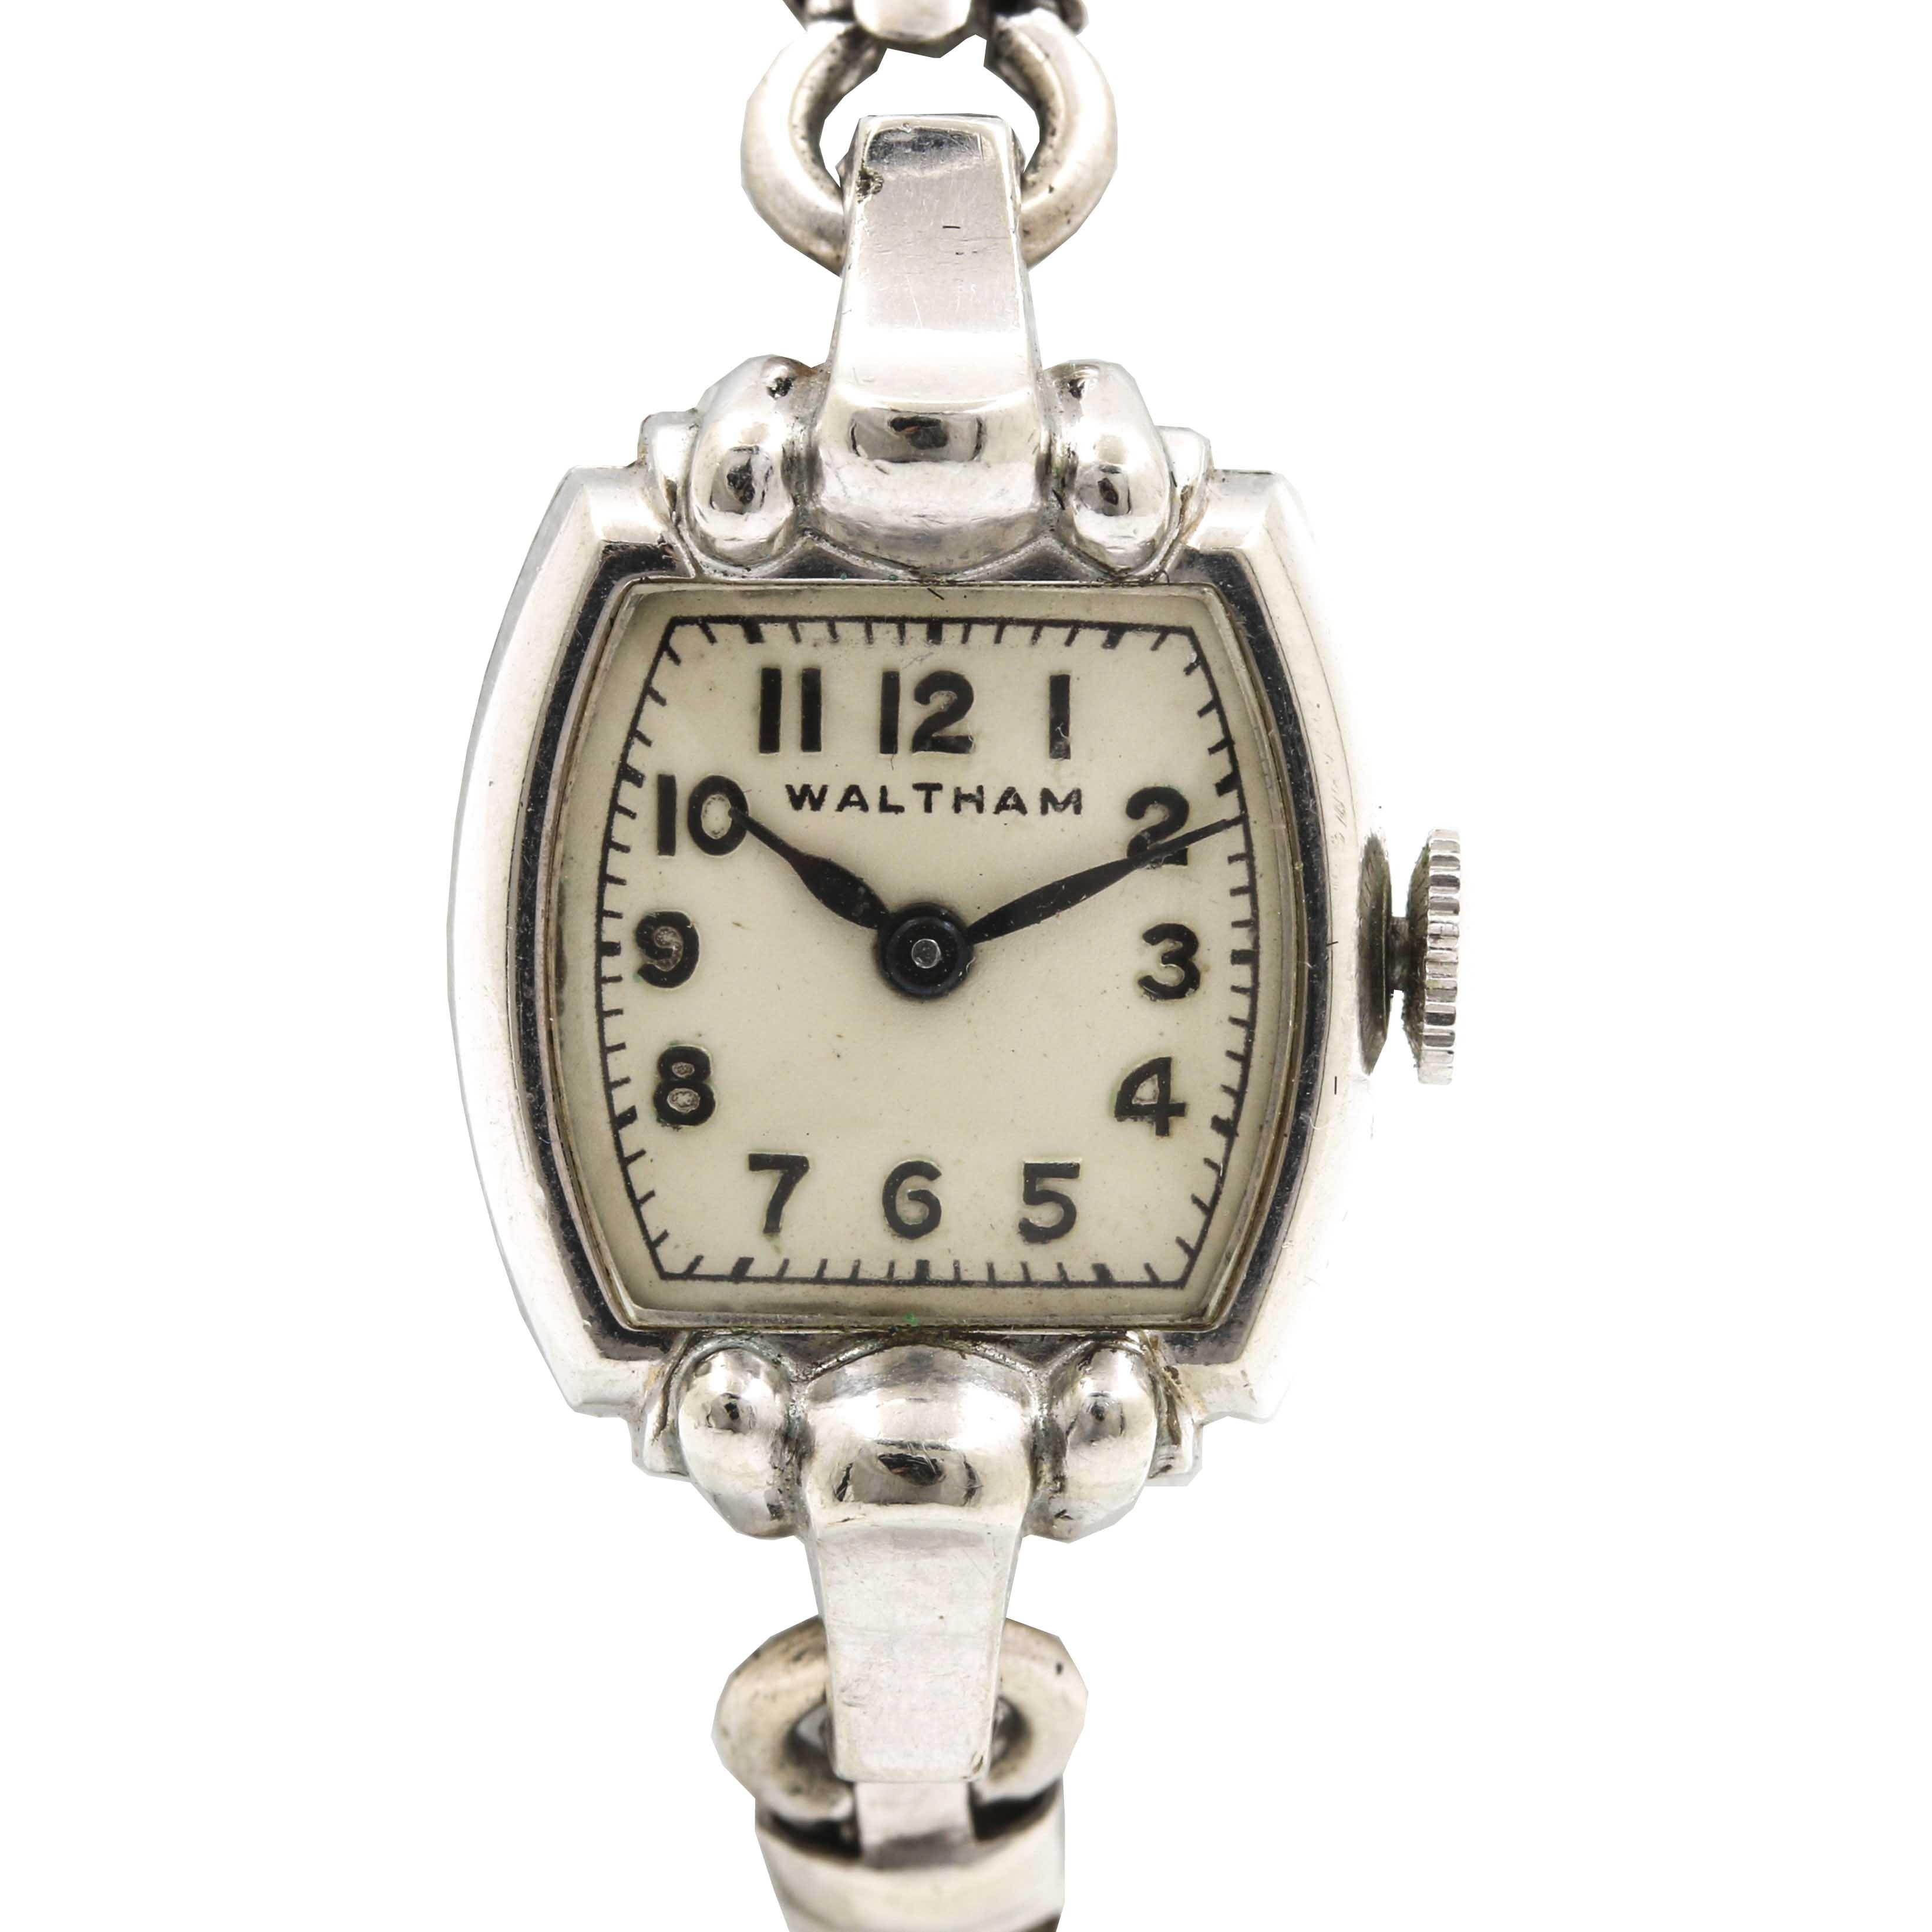 Waltham Gold Filled Wristwatch